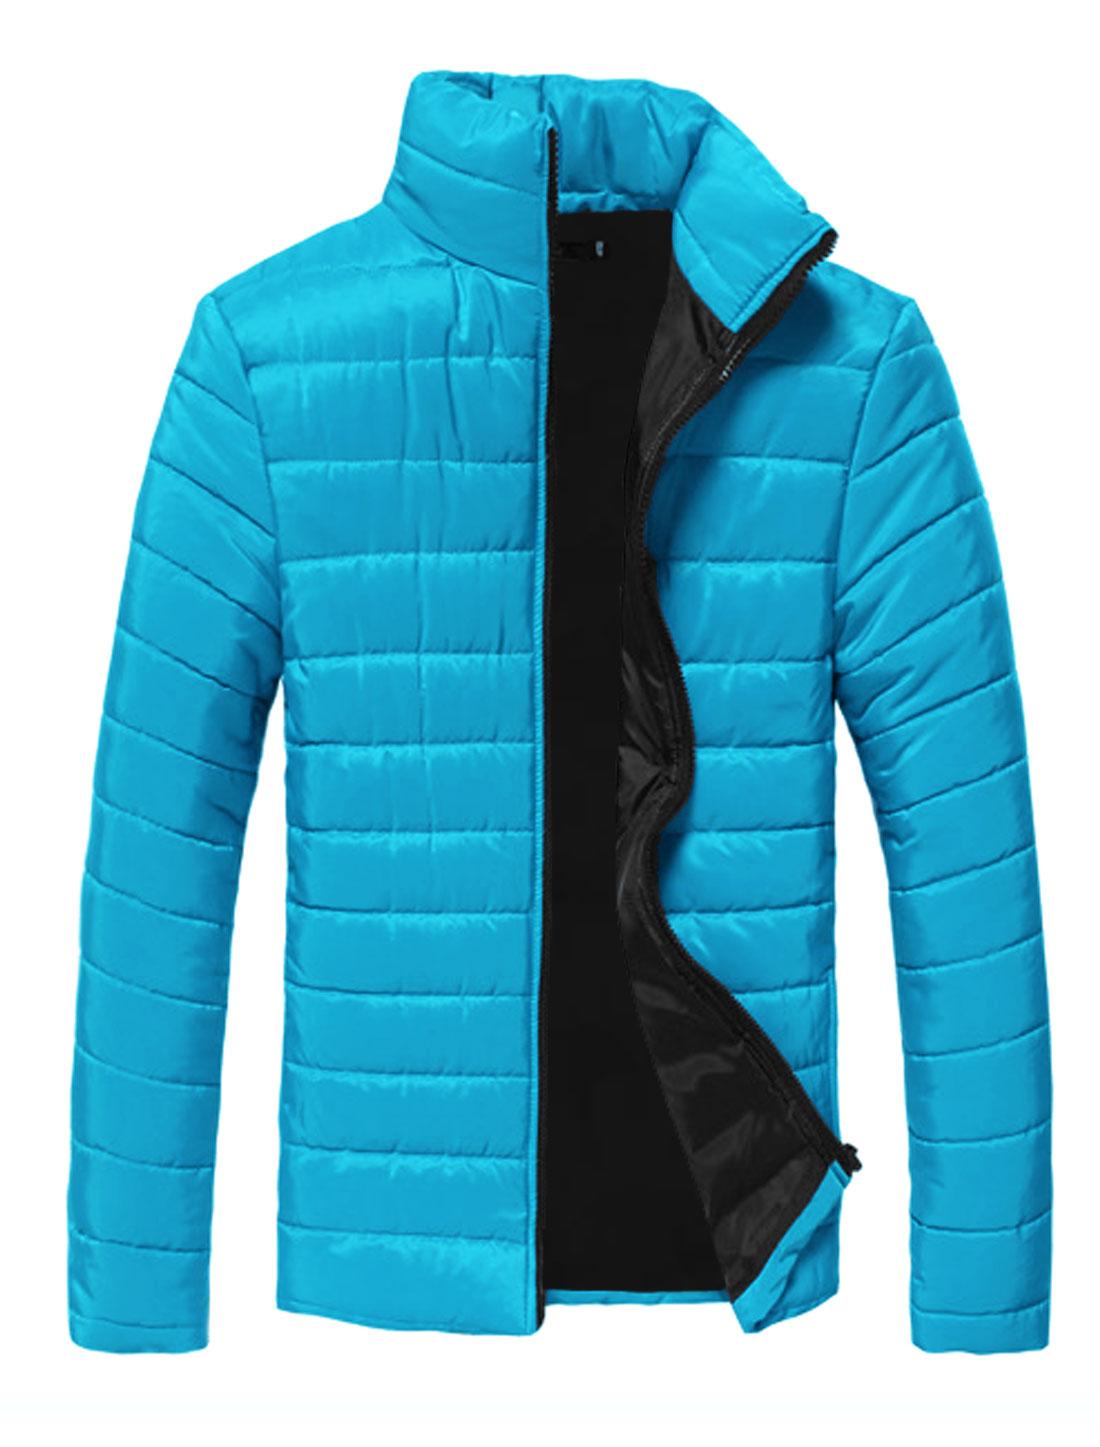 Men Blue Zip Down Zipper Pockets Slim Cut Full Sleeves Warm Padded Coat S